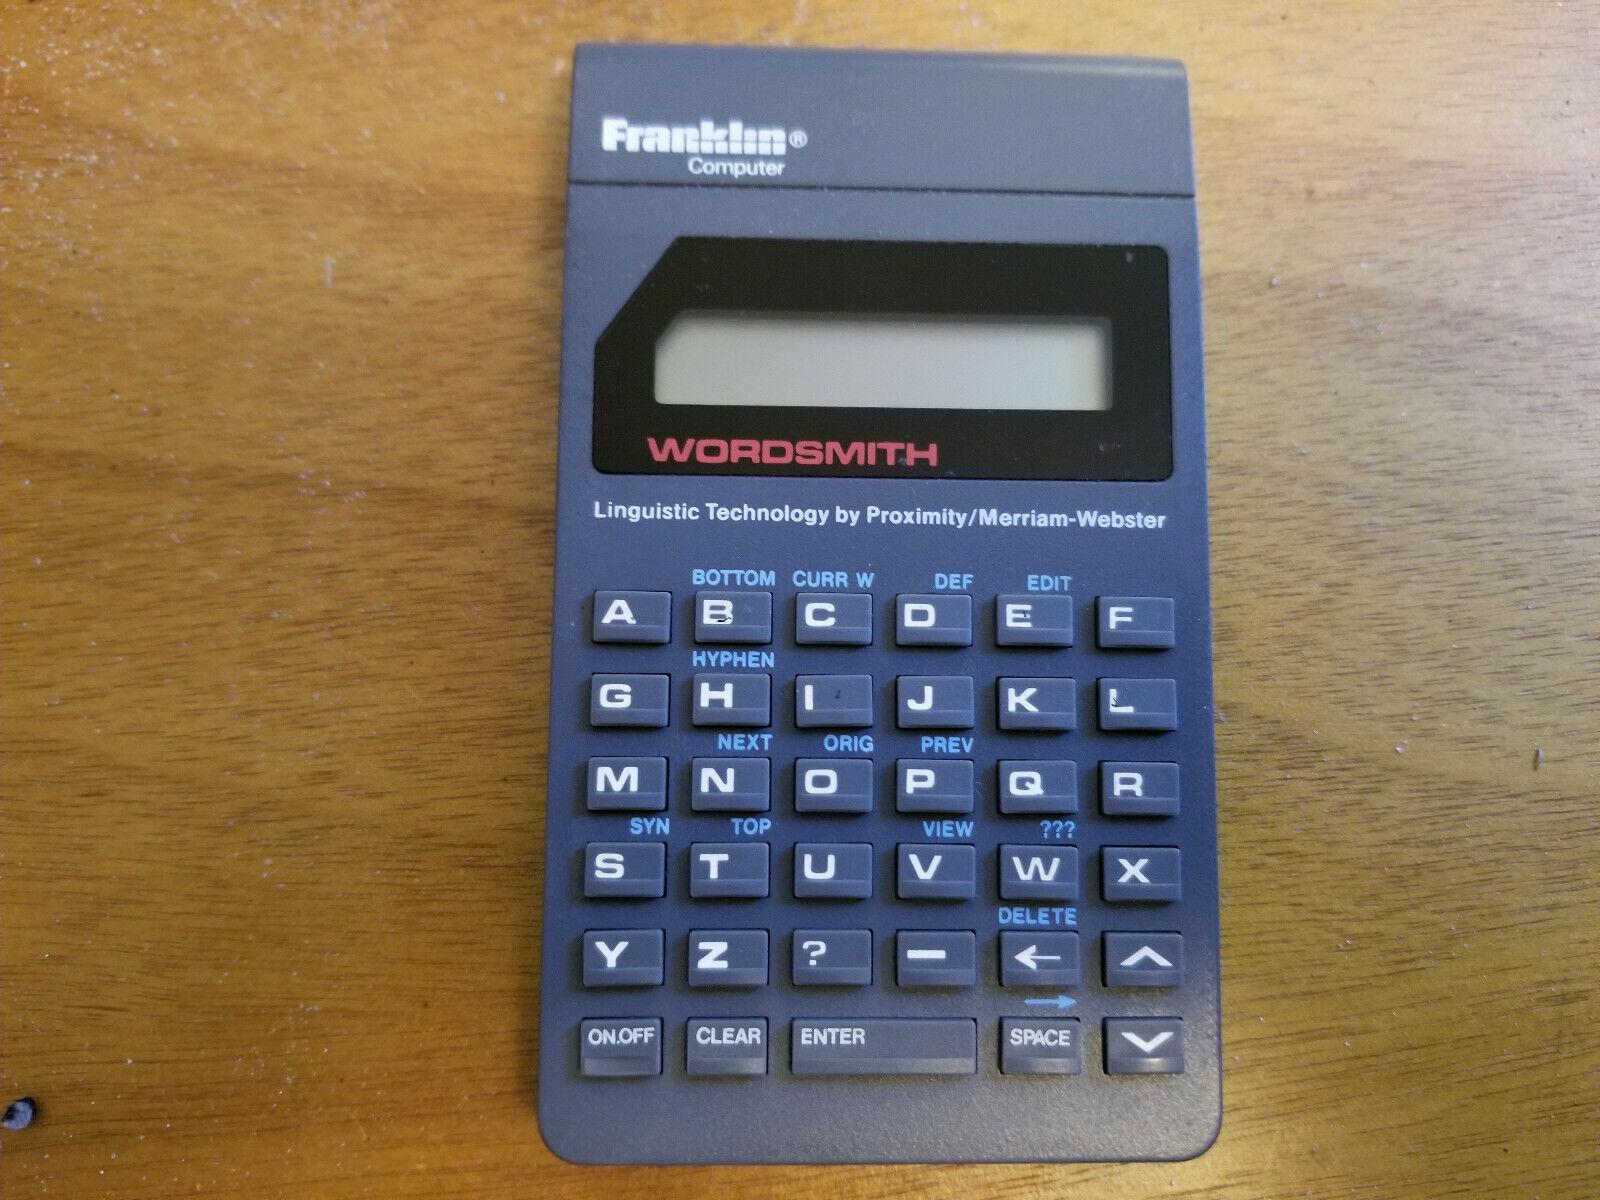 Franklin Computer Wordsmith Linguistic Technology Merriam Webster PT-440